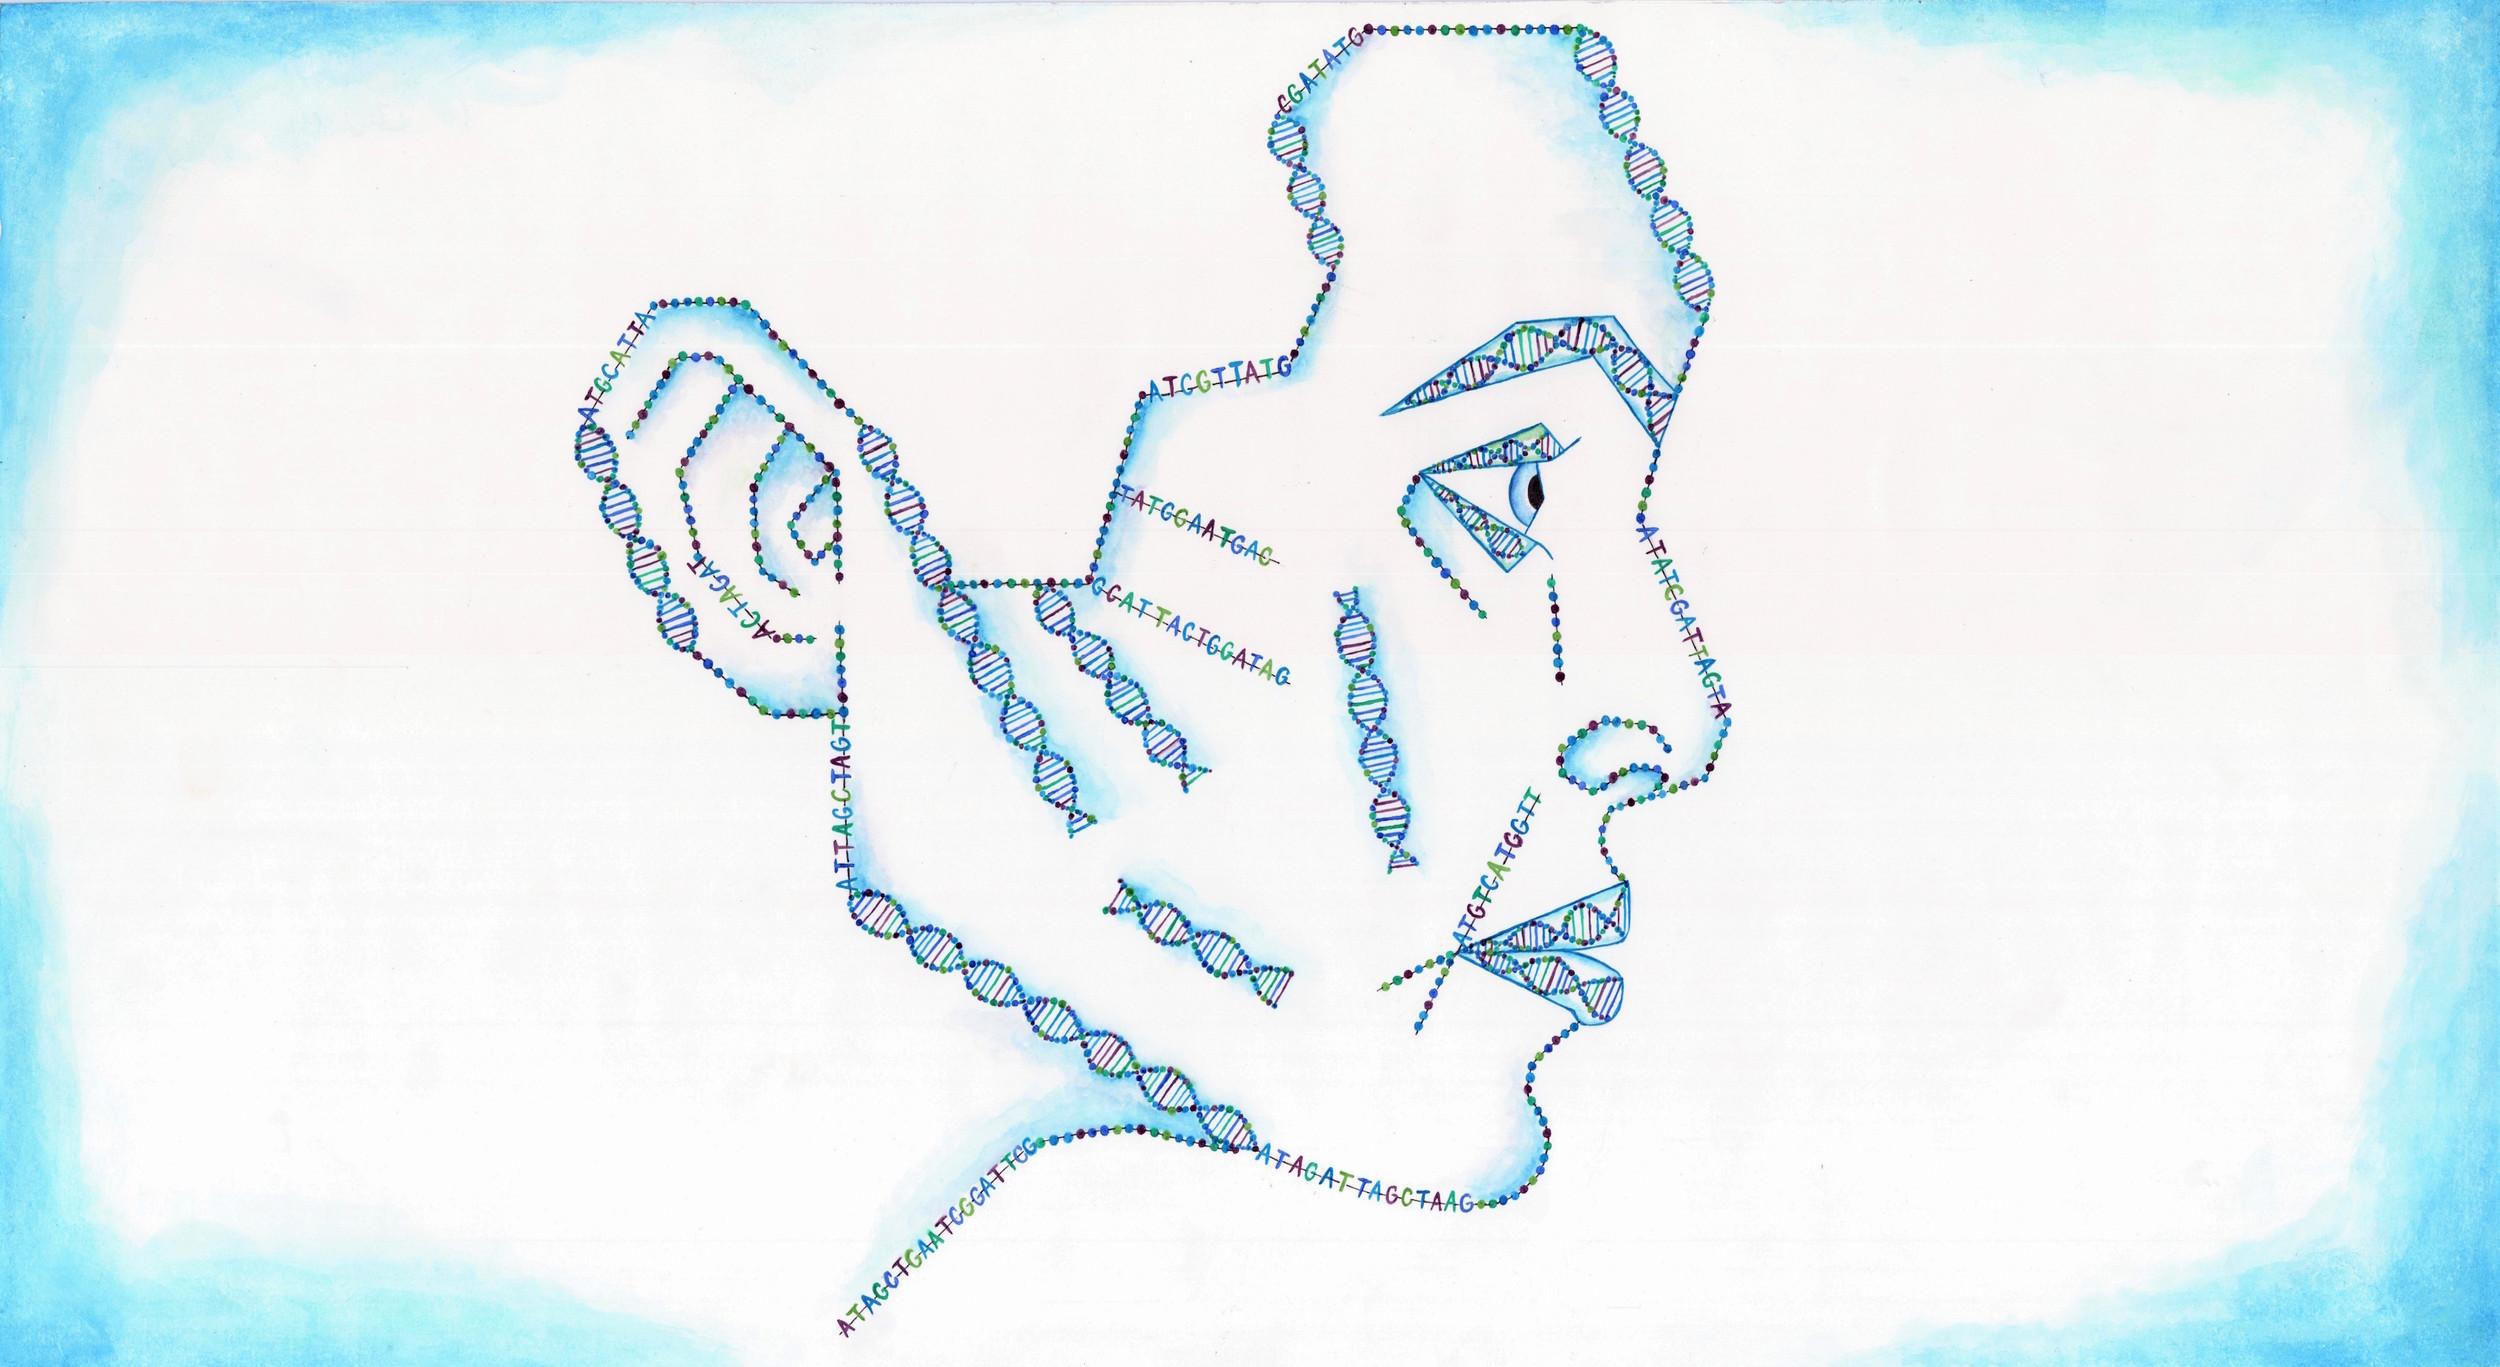 Illustration by Shruti Kotecha